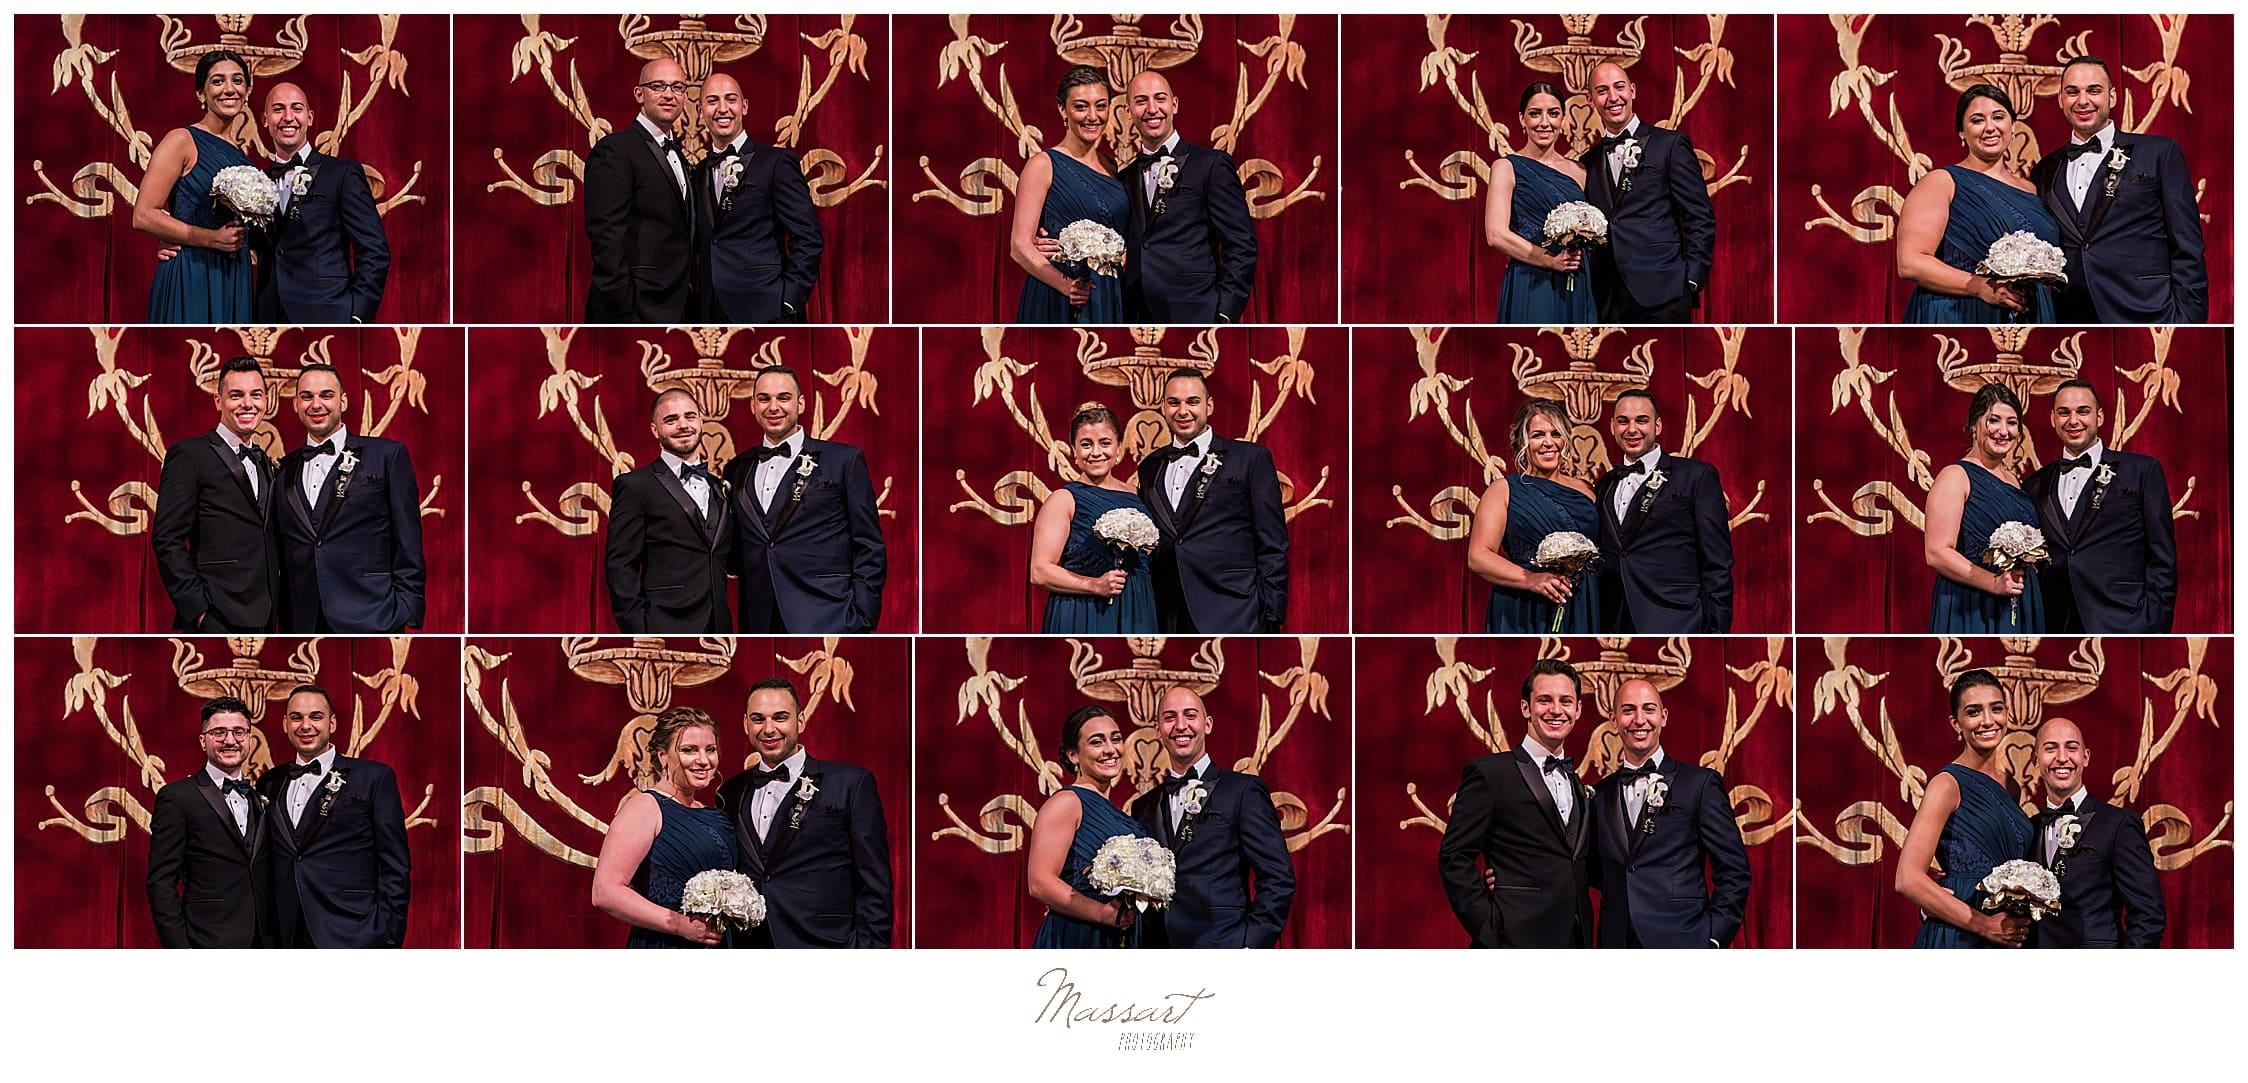 RI, CT, MA wedding photographers Massart Photography capture Palace Theater wedding